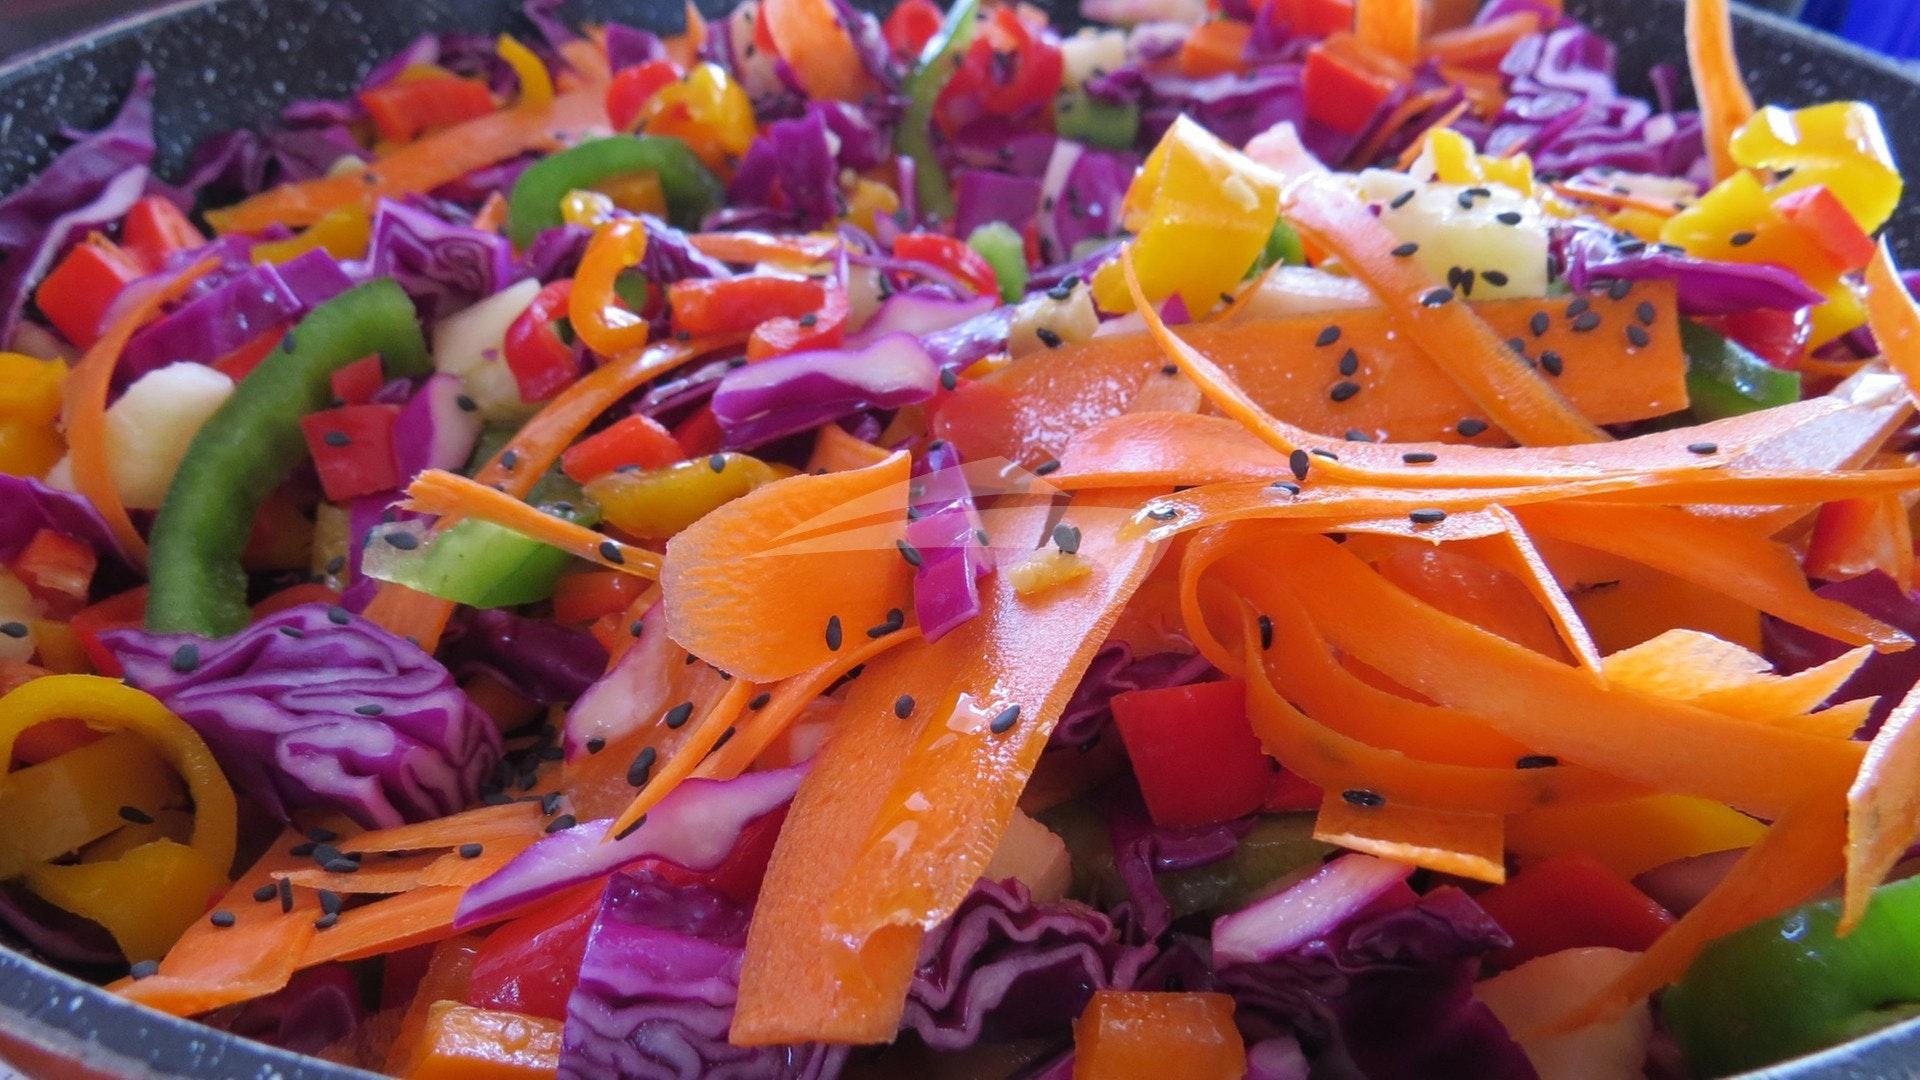 Healthy and tasteful cuisine